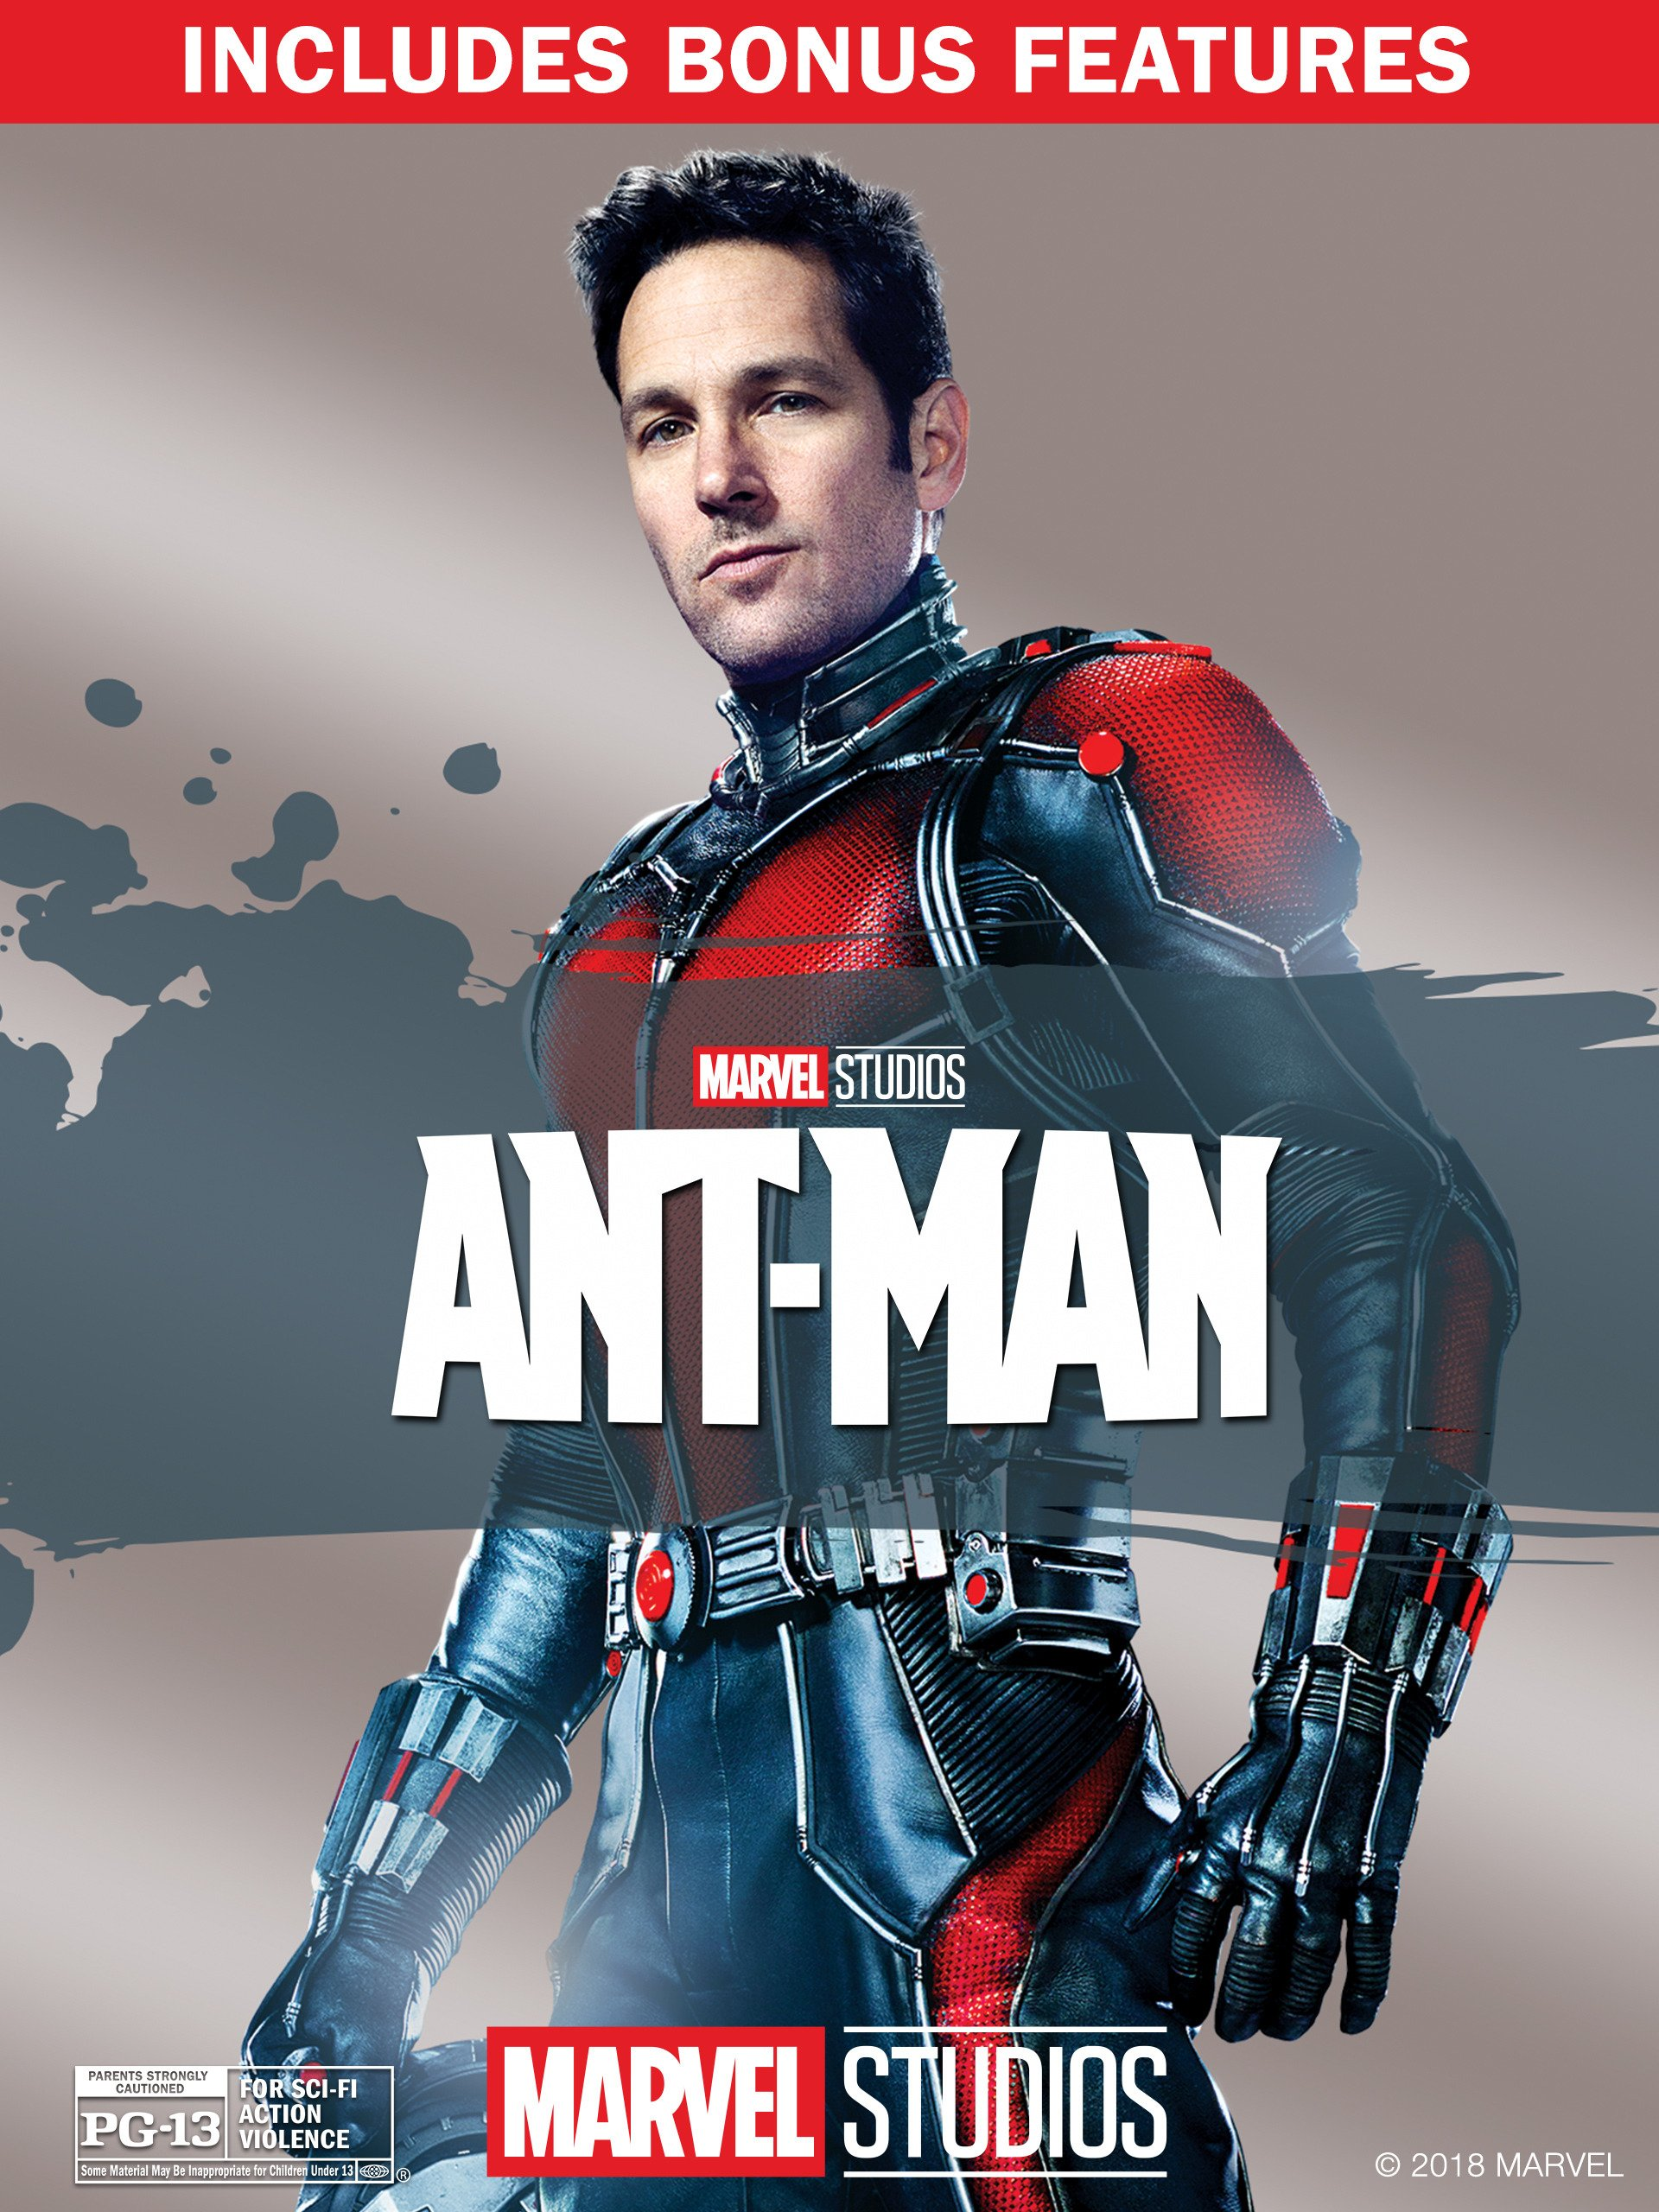 Ant-Man (Plus Bonus Features) by